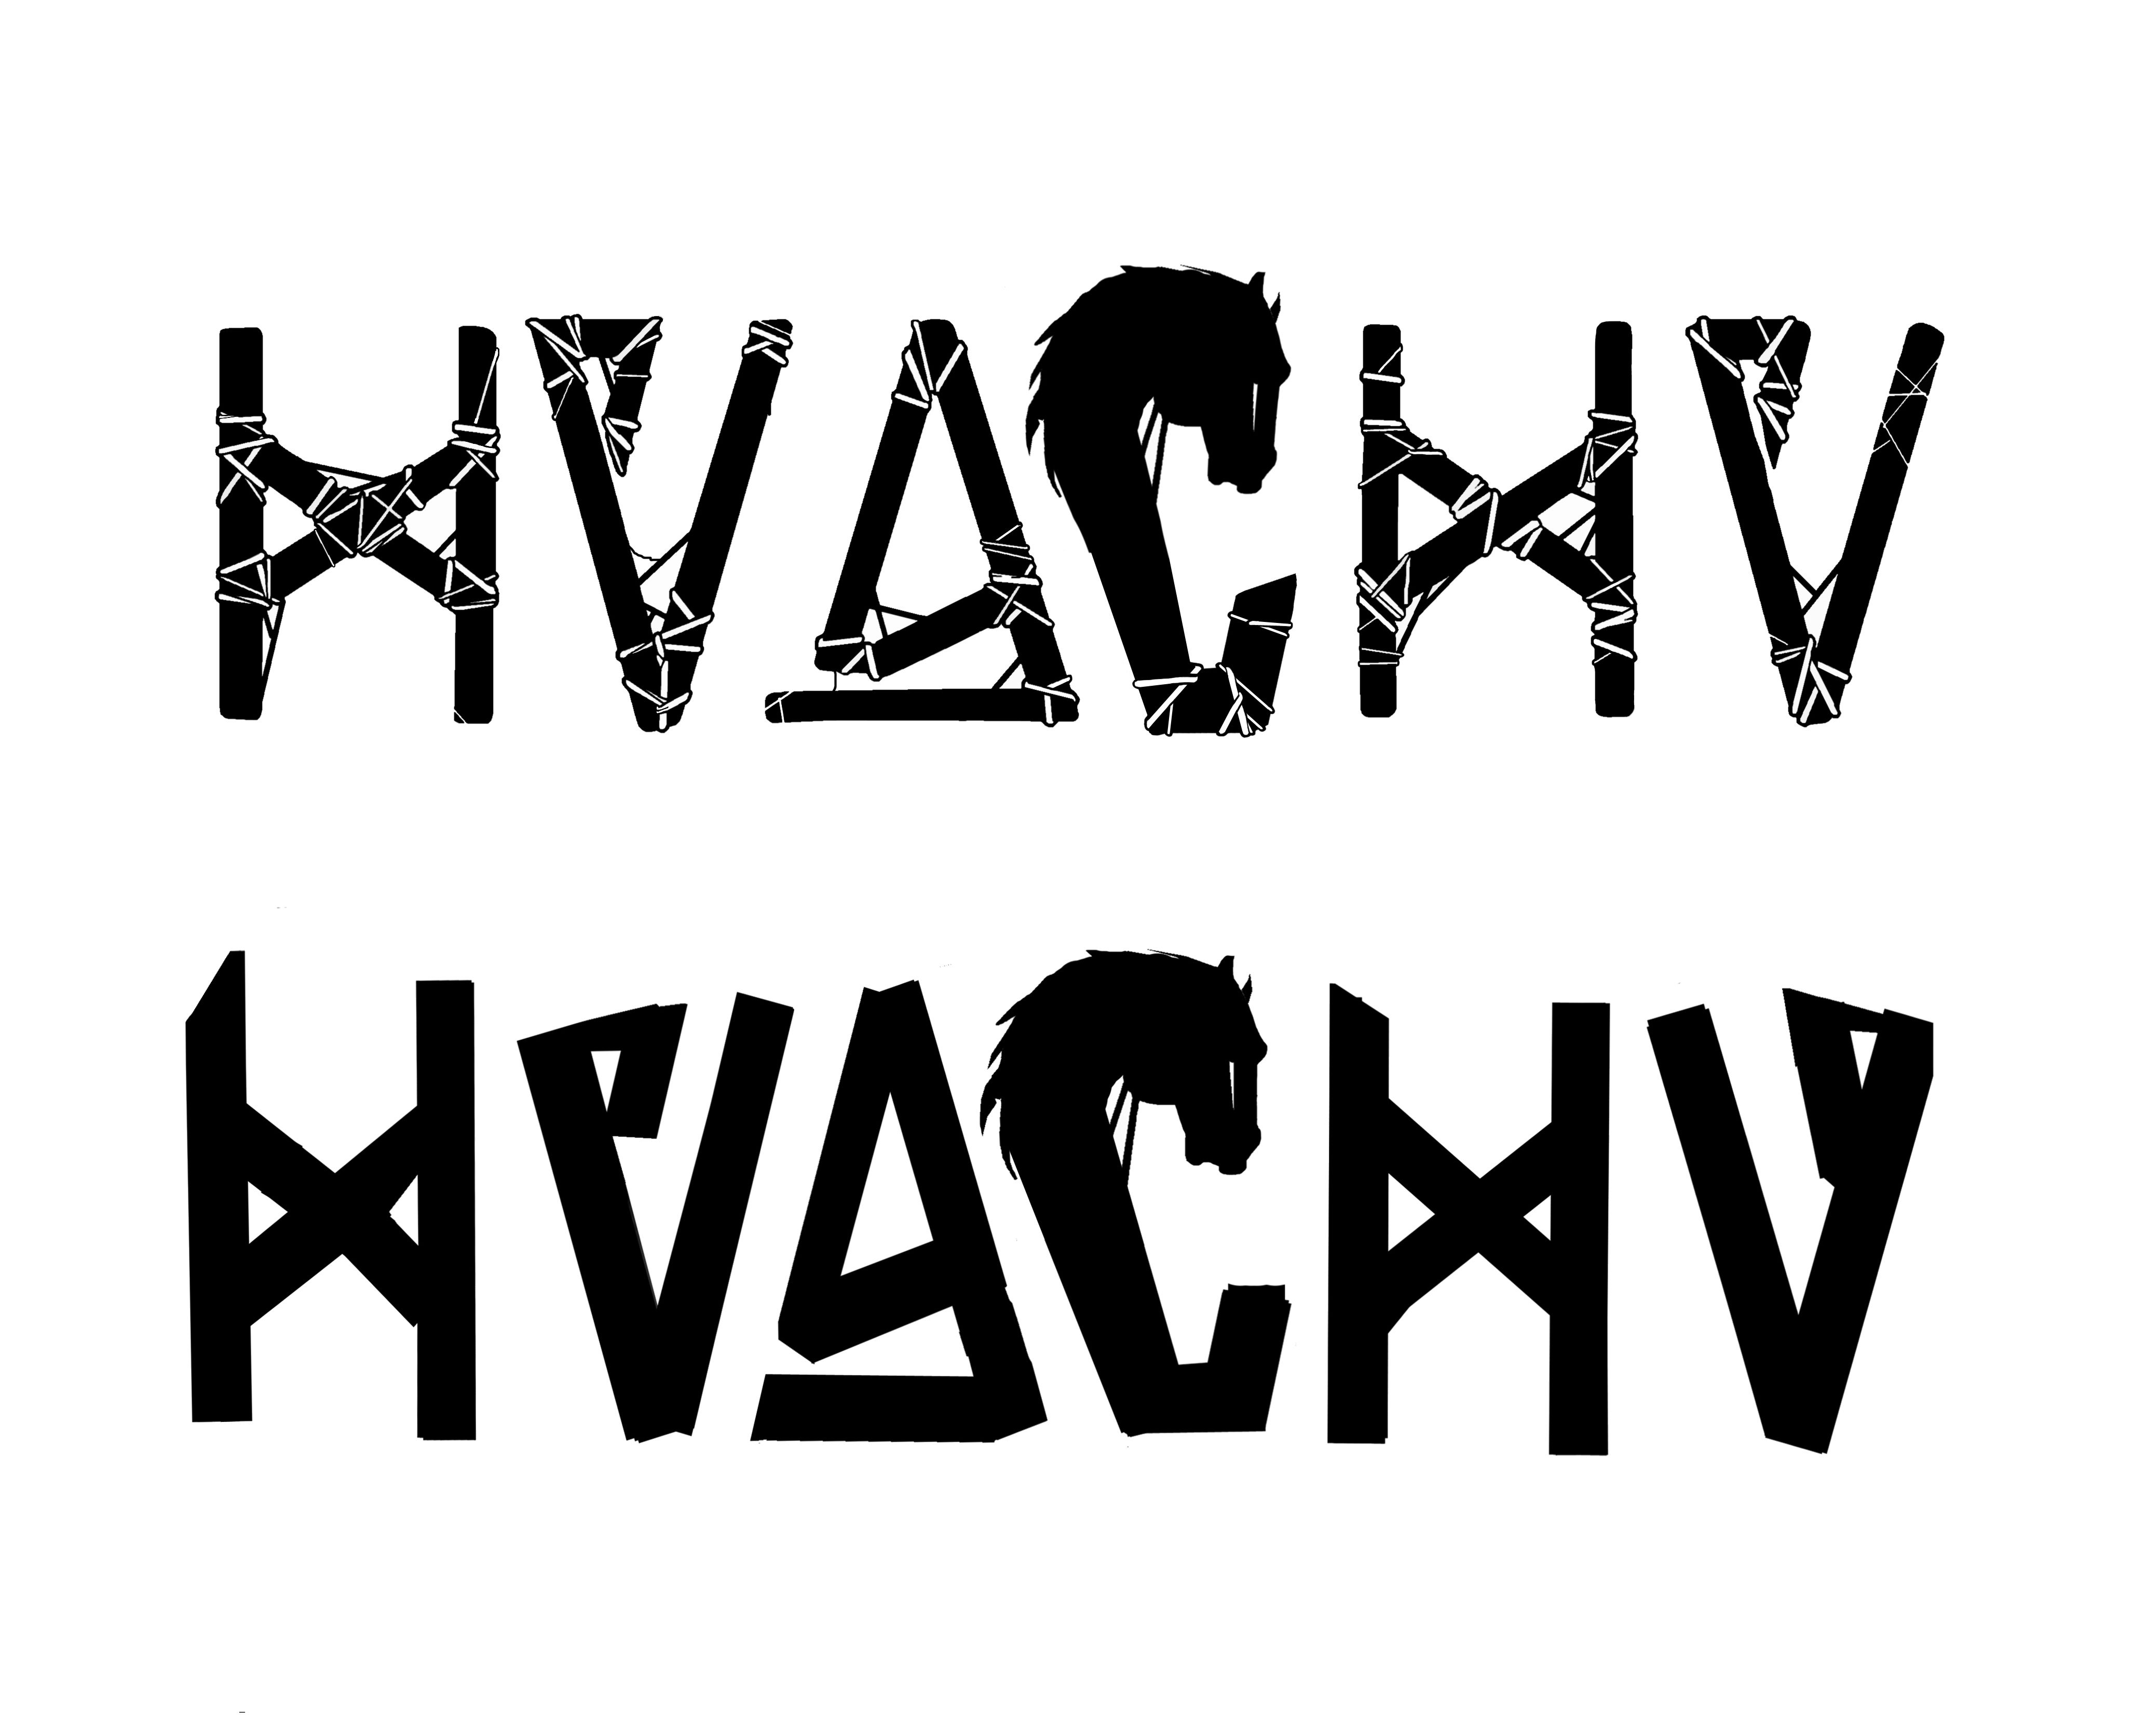 Color art tipografia - Logotipo Para La Banda De Rock Huachu Palabra Quechua Para Designar Al Gaucho Hu Rfano